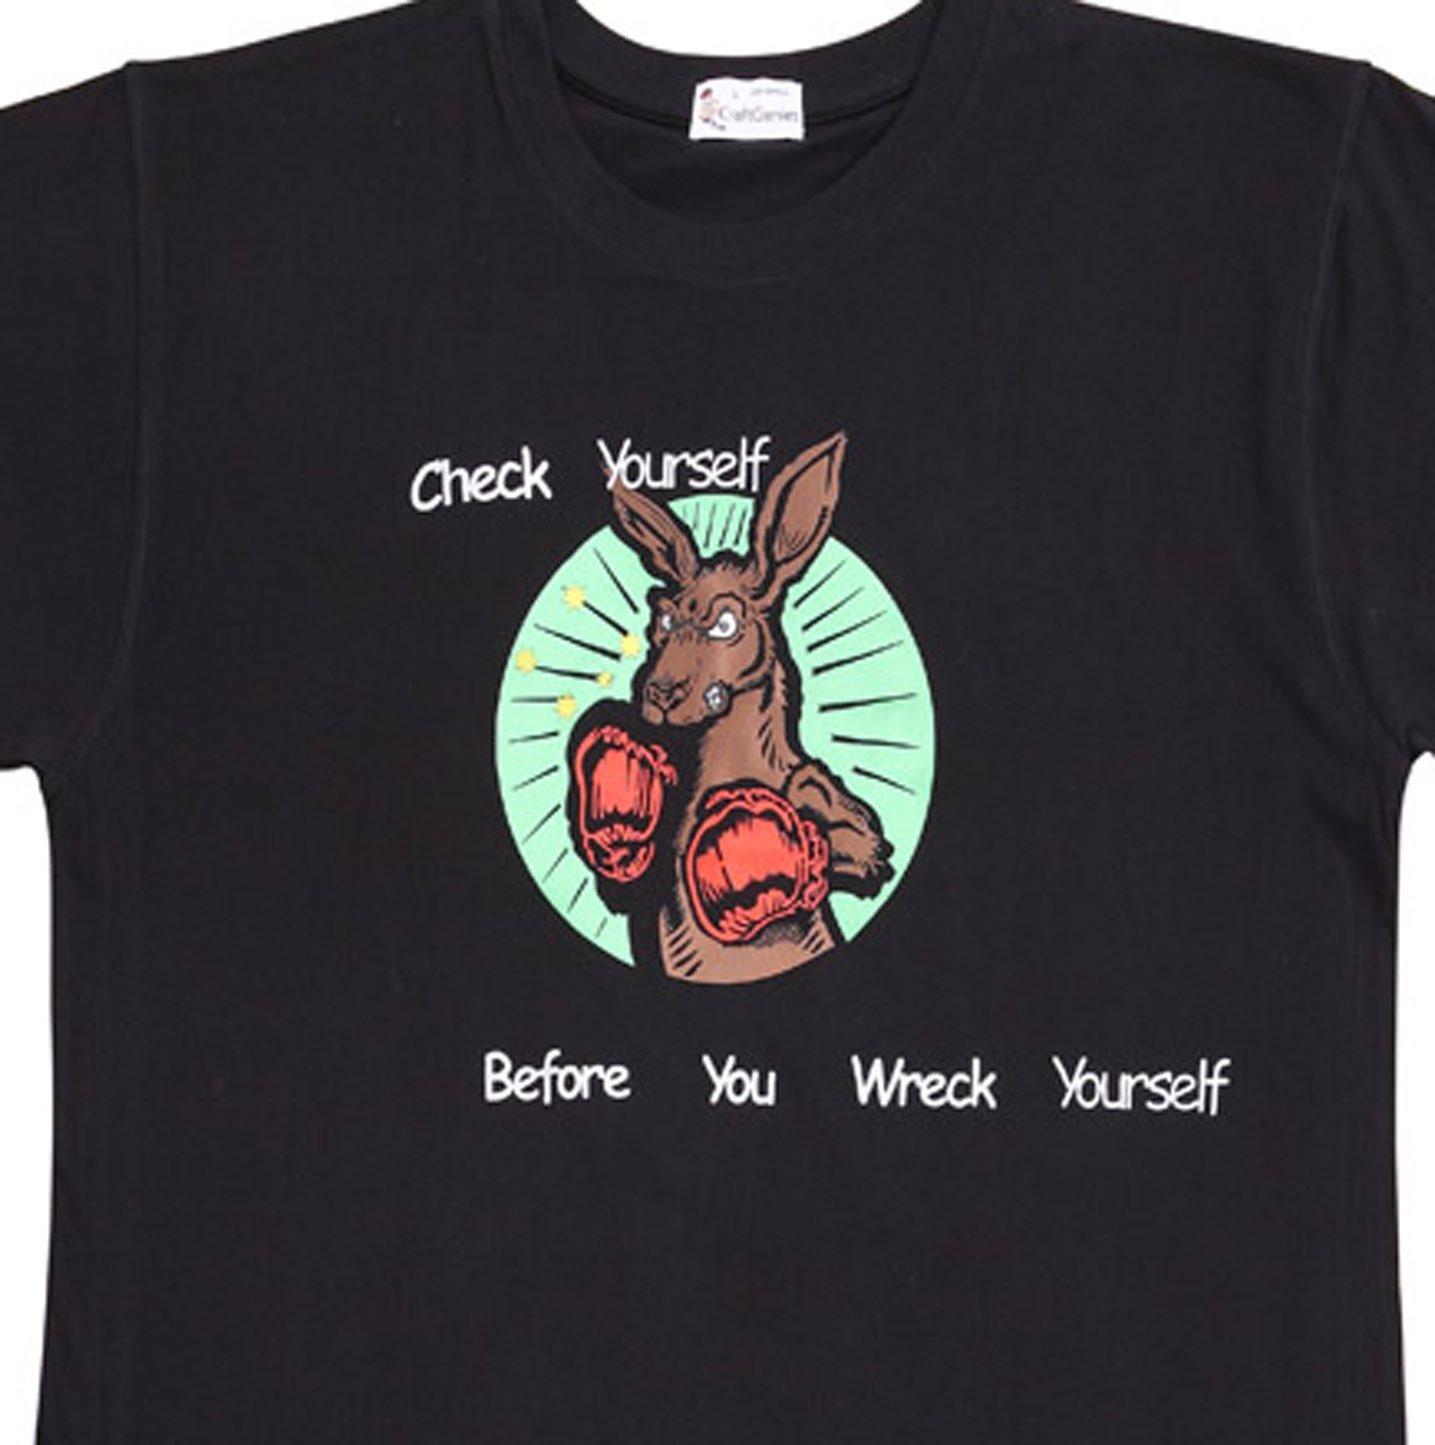 Boxing Kangaroo T-Shirt Australian Shirts for Men - New  (Men's Medium)